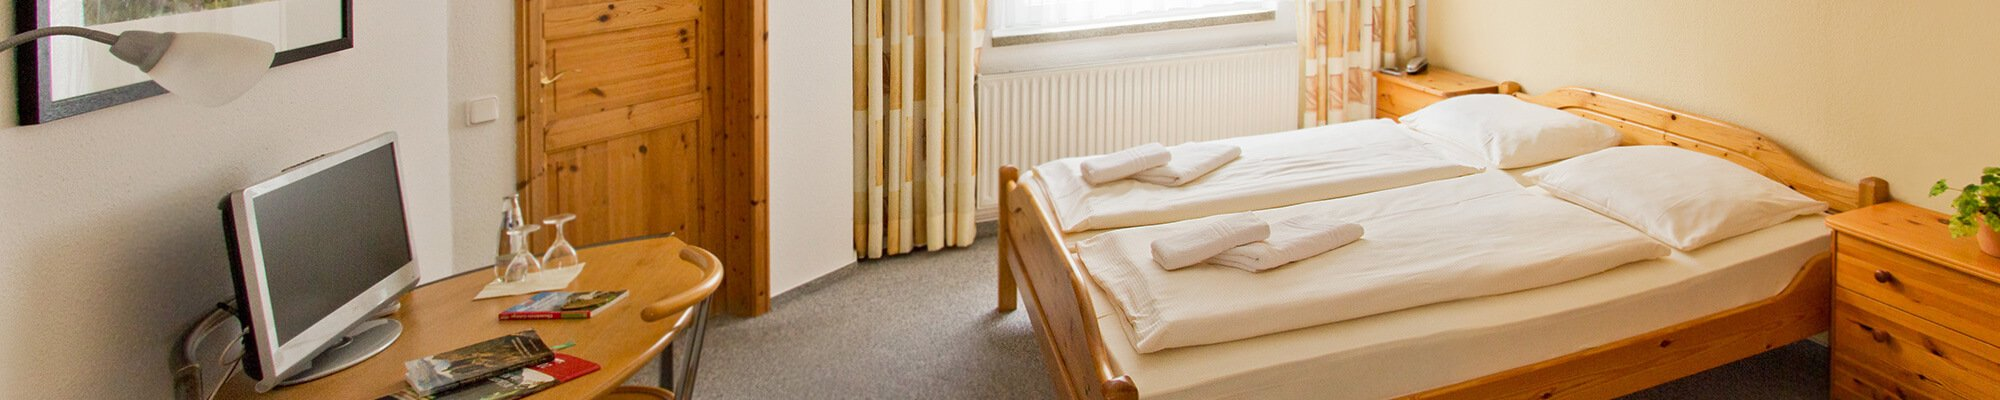 Hotel Grundmühle Doppelzimmer